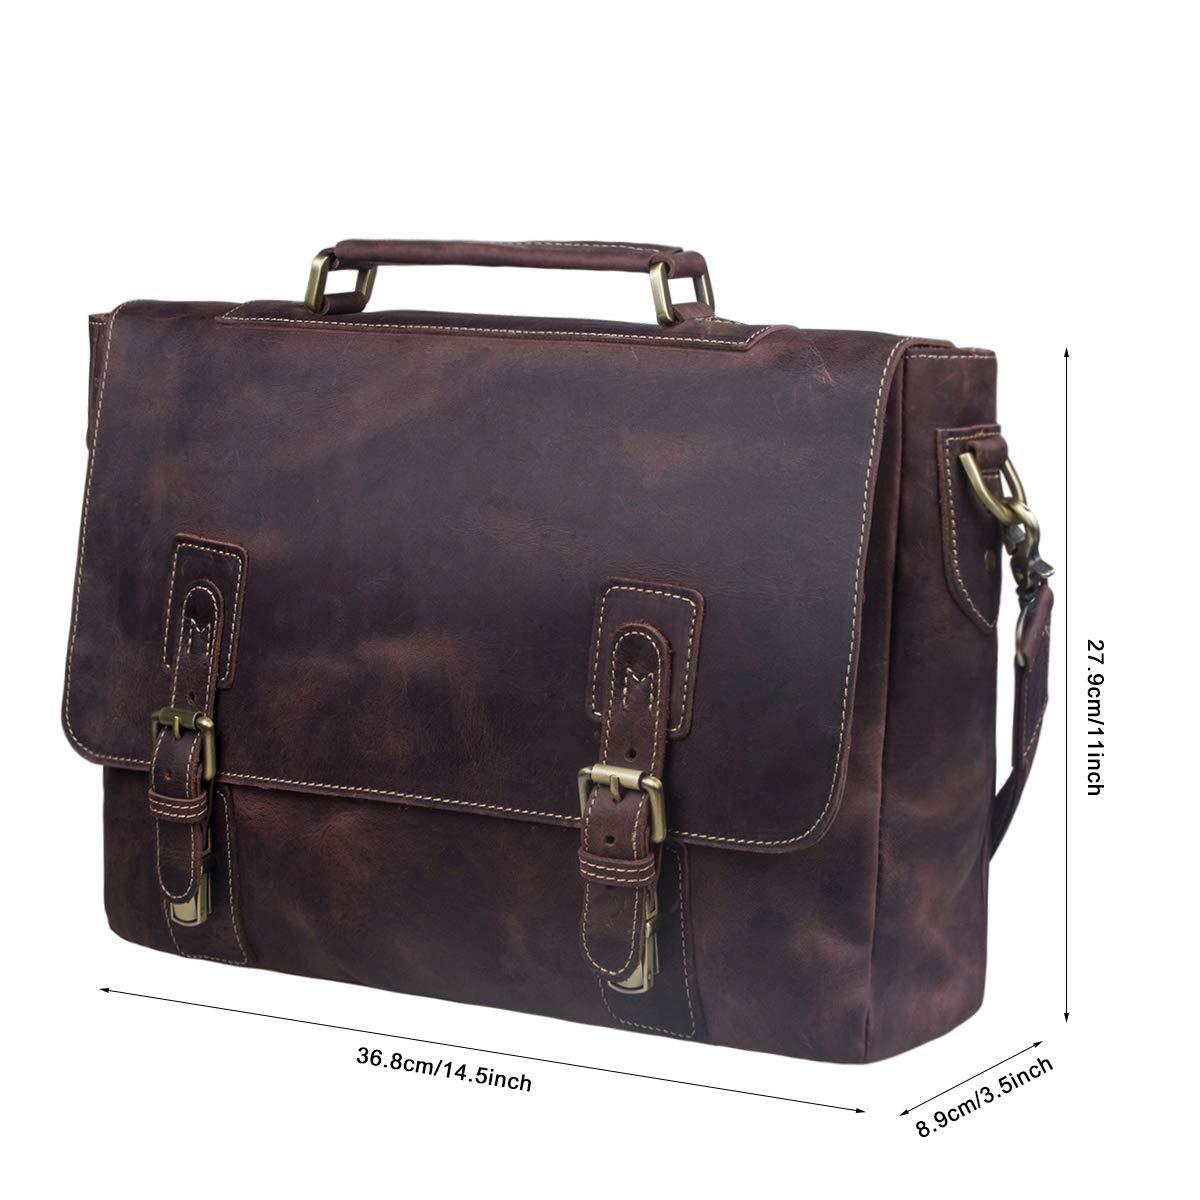 S-ZONE Men's Crazy Horse Leather Satchel Briefcase Shoulder Bag Messenger Bag 14'' Laptop Tote Bag by S-ZONE (Image #7)